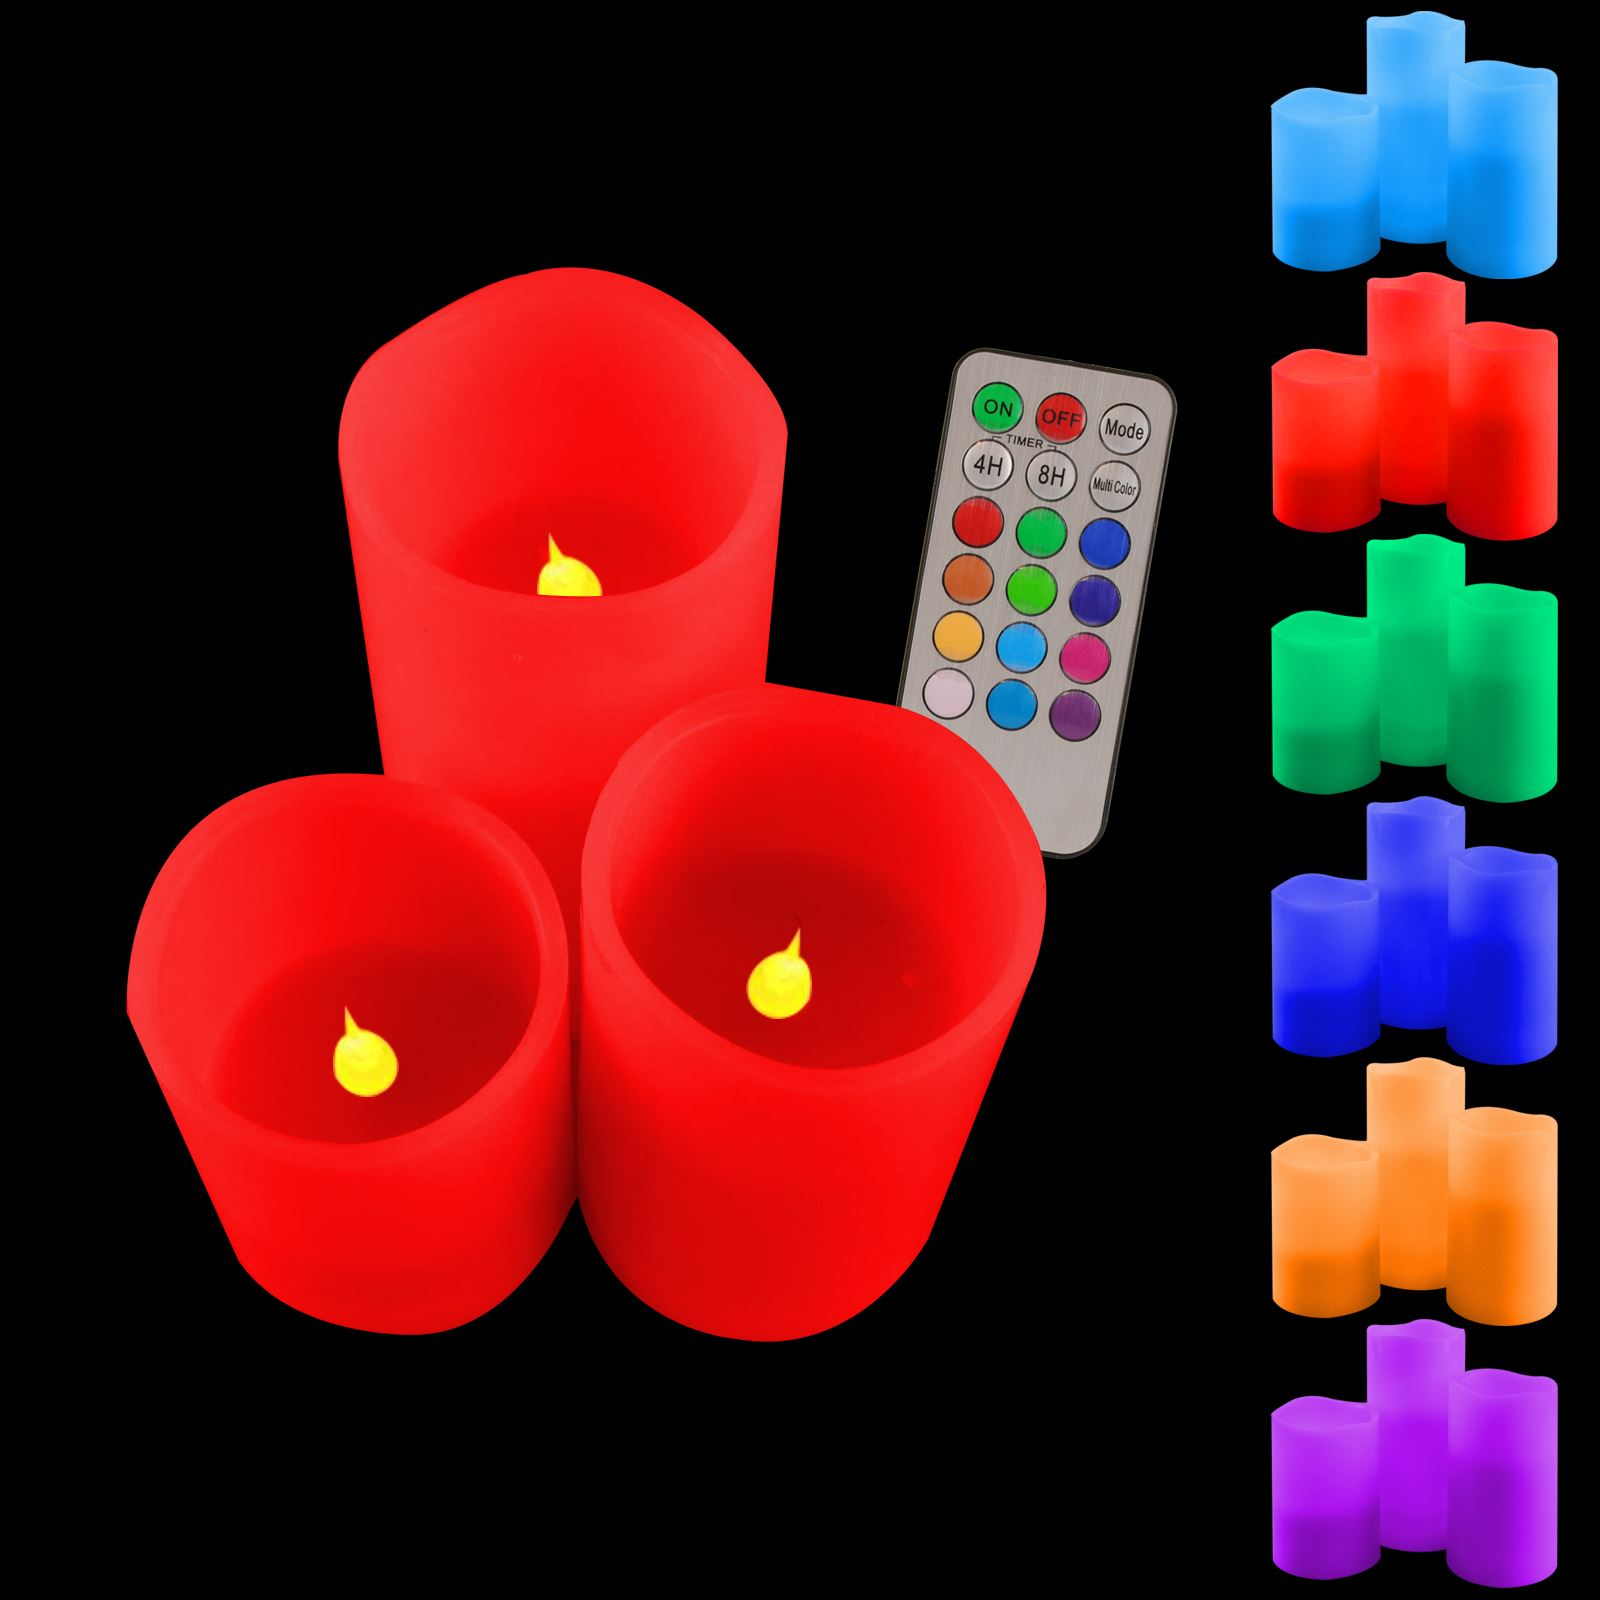 candles battery flameless led rgb flickering tea lights remote. Black Bedroom Furniture Sets. Home Design Ideas